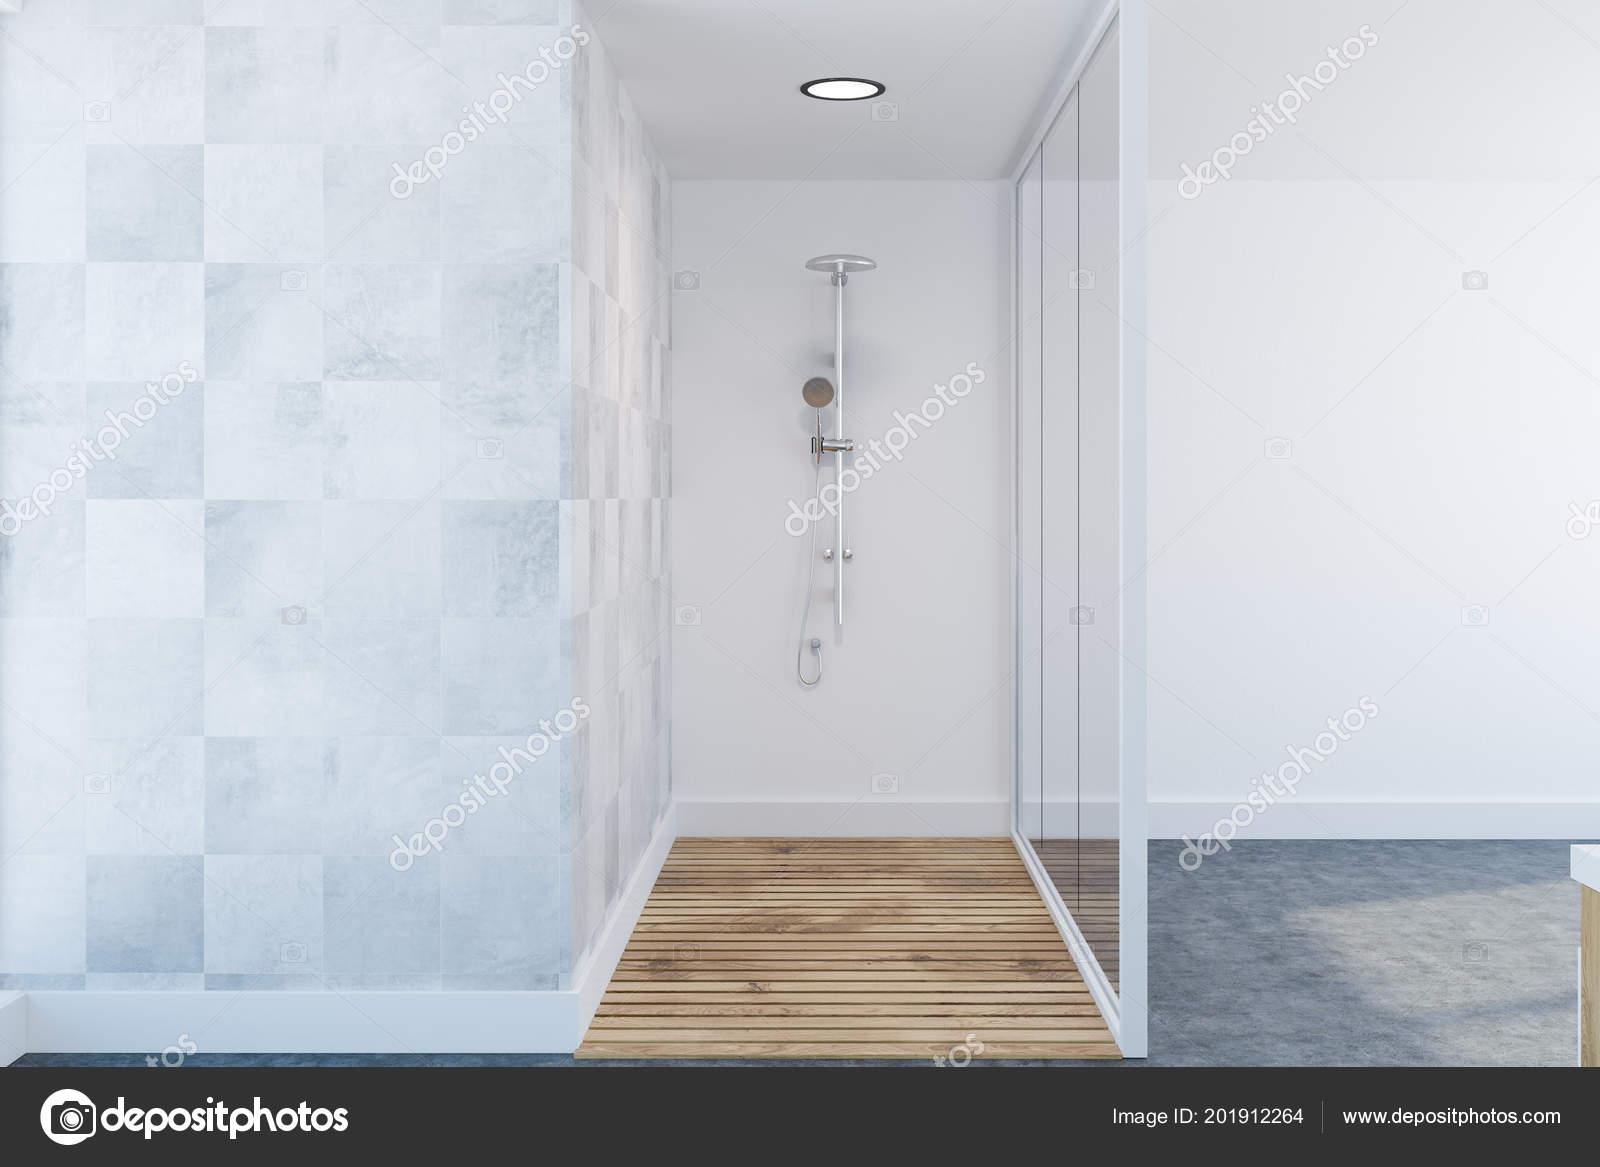 White Tile Luxury Bathroom Interior Concrete Floor Glass White Wall ...